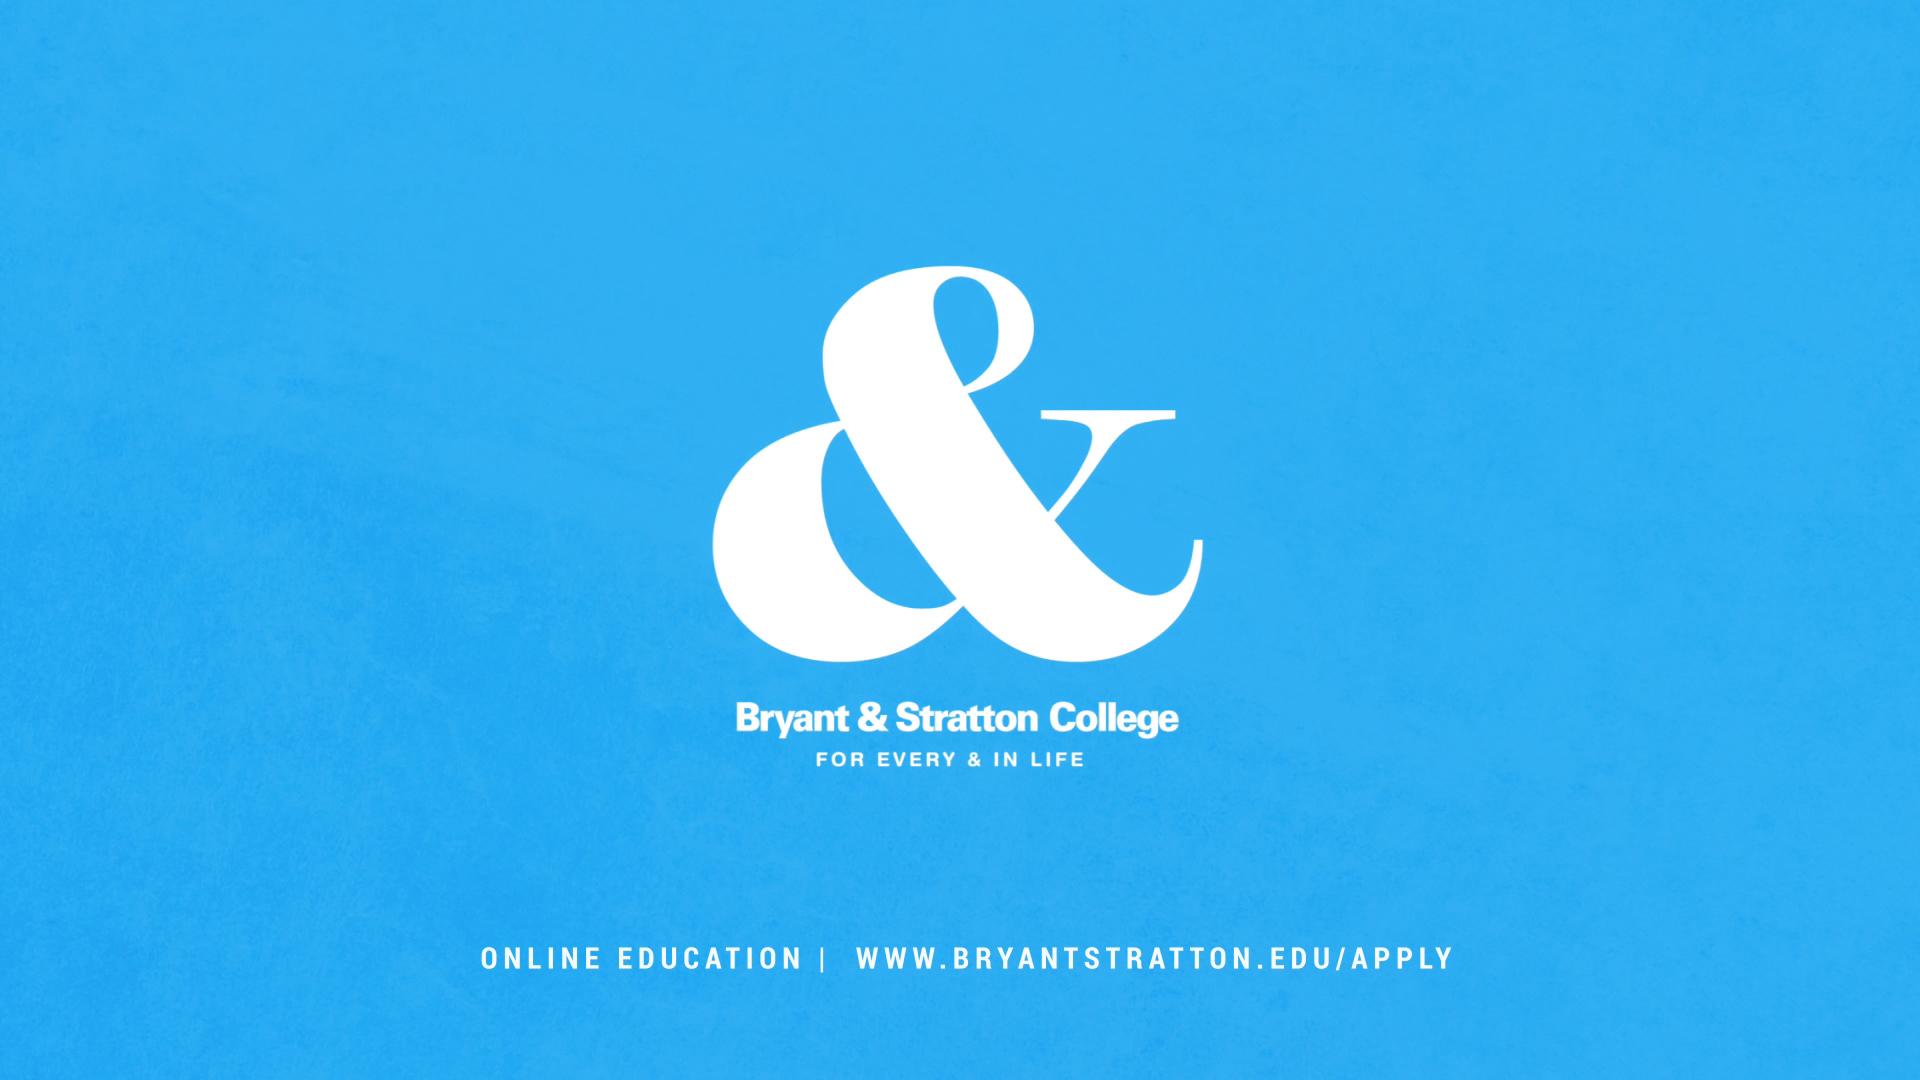 Bryant_Stratton_YouCan_2017__0000_Layer 13.jpg